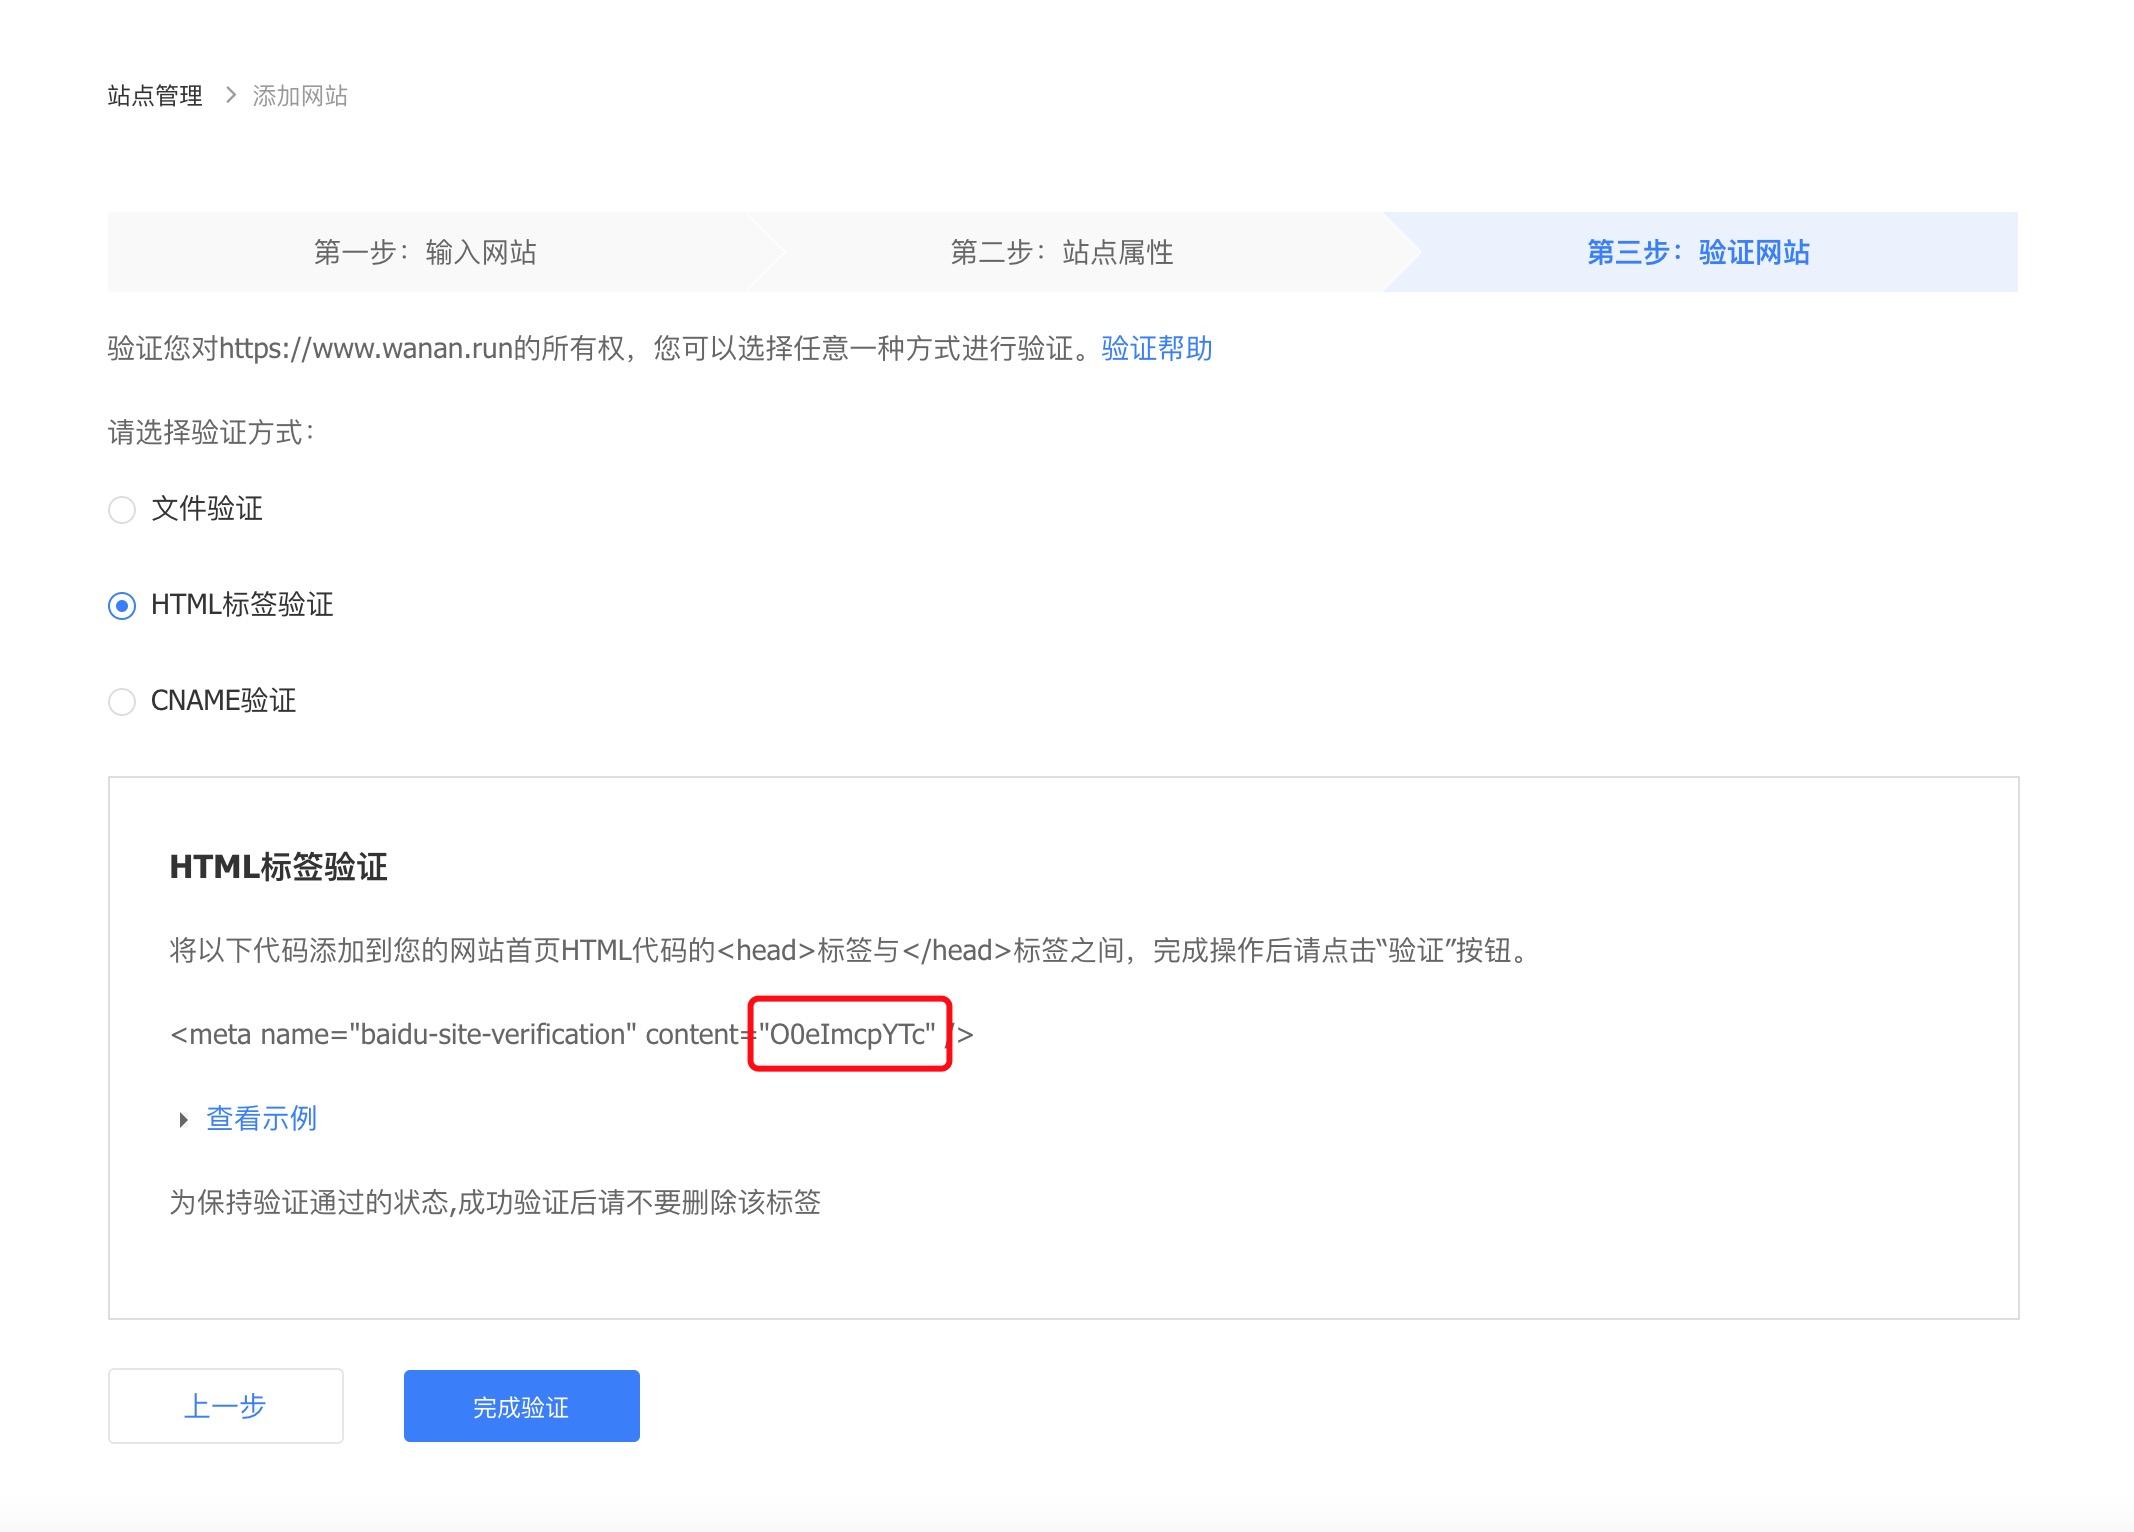 baidu_site_verification